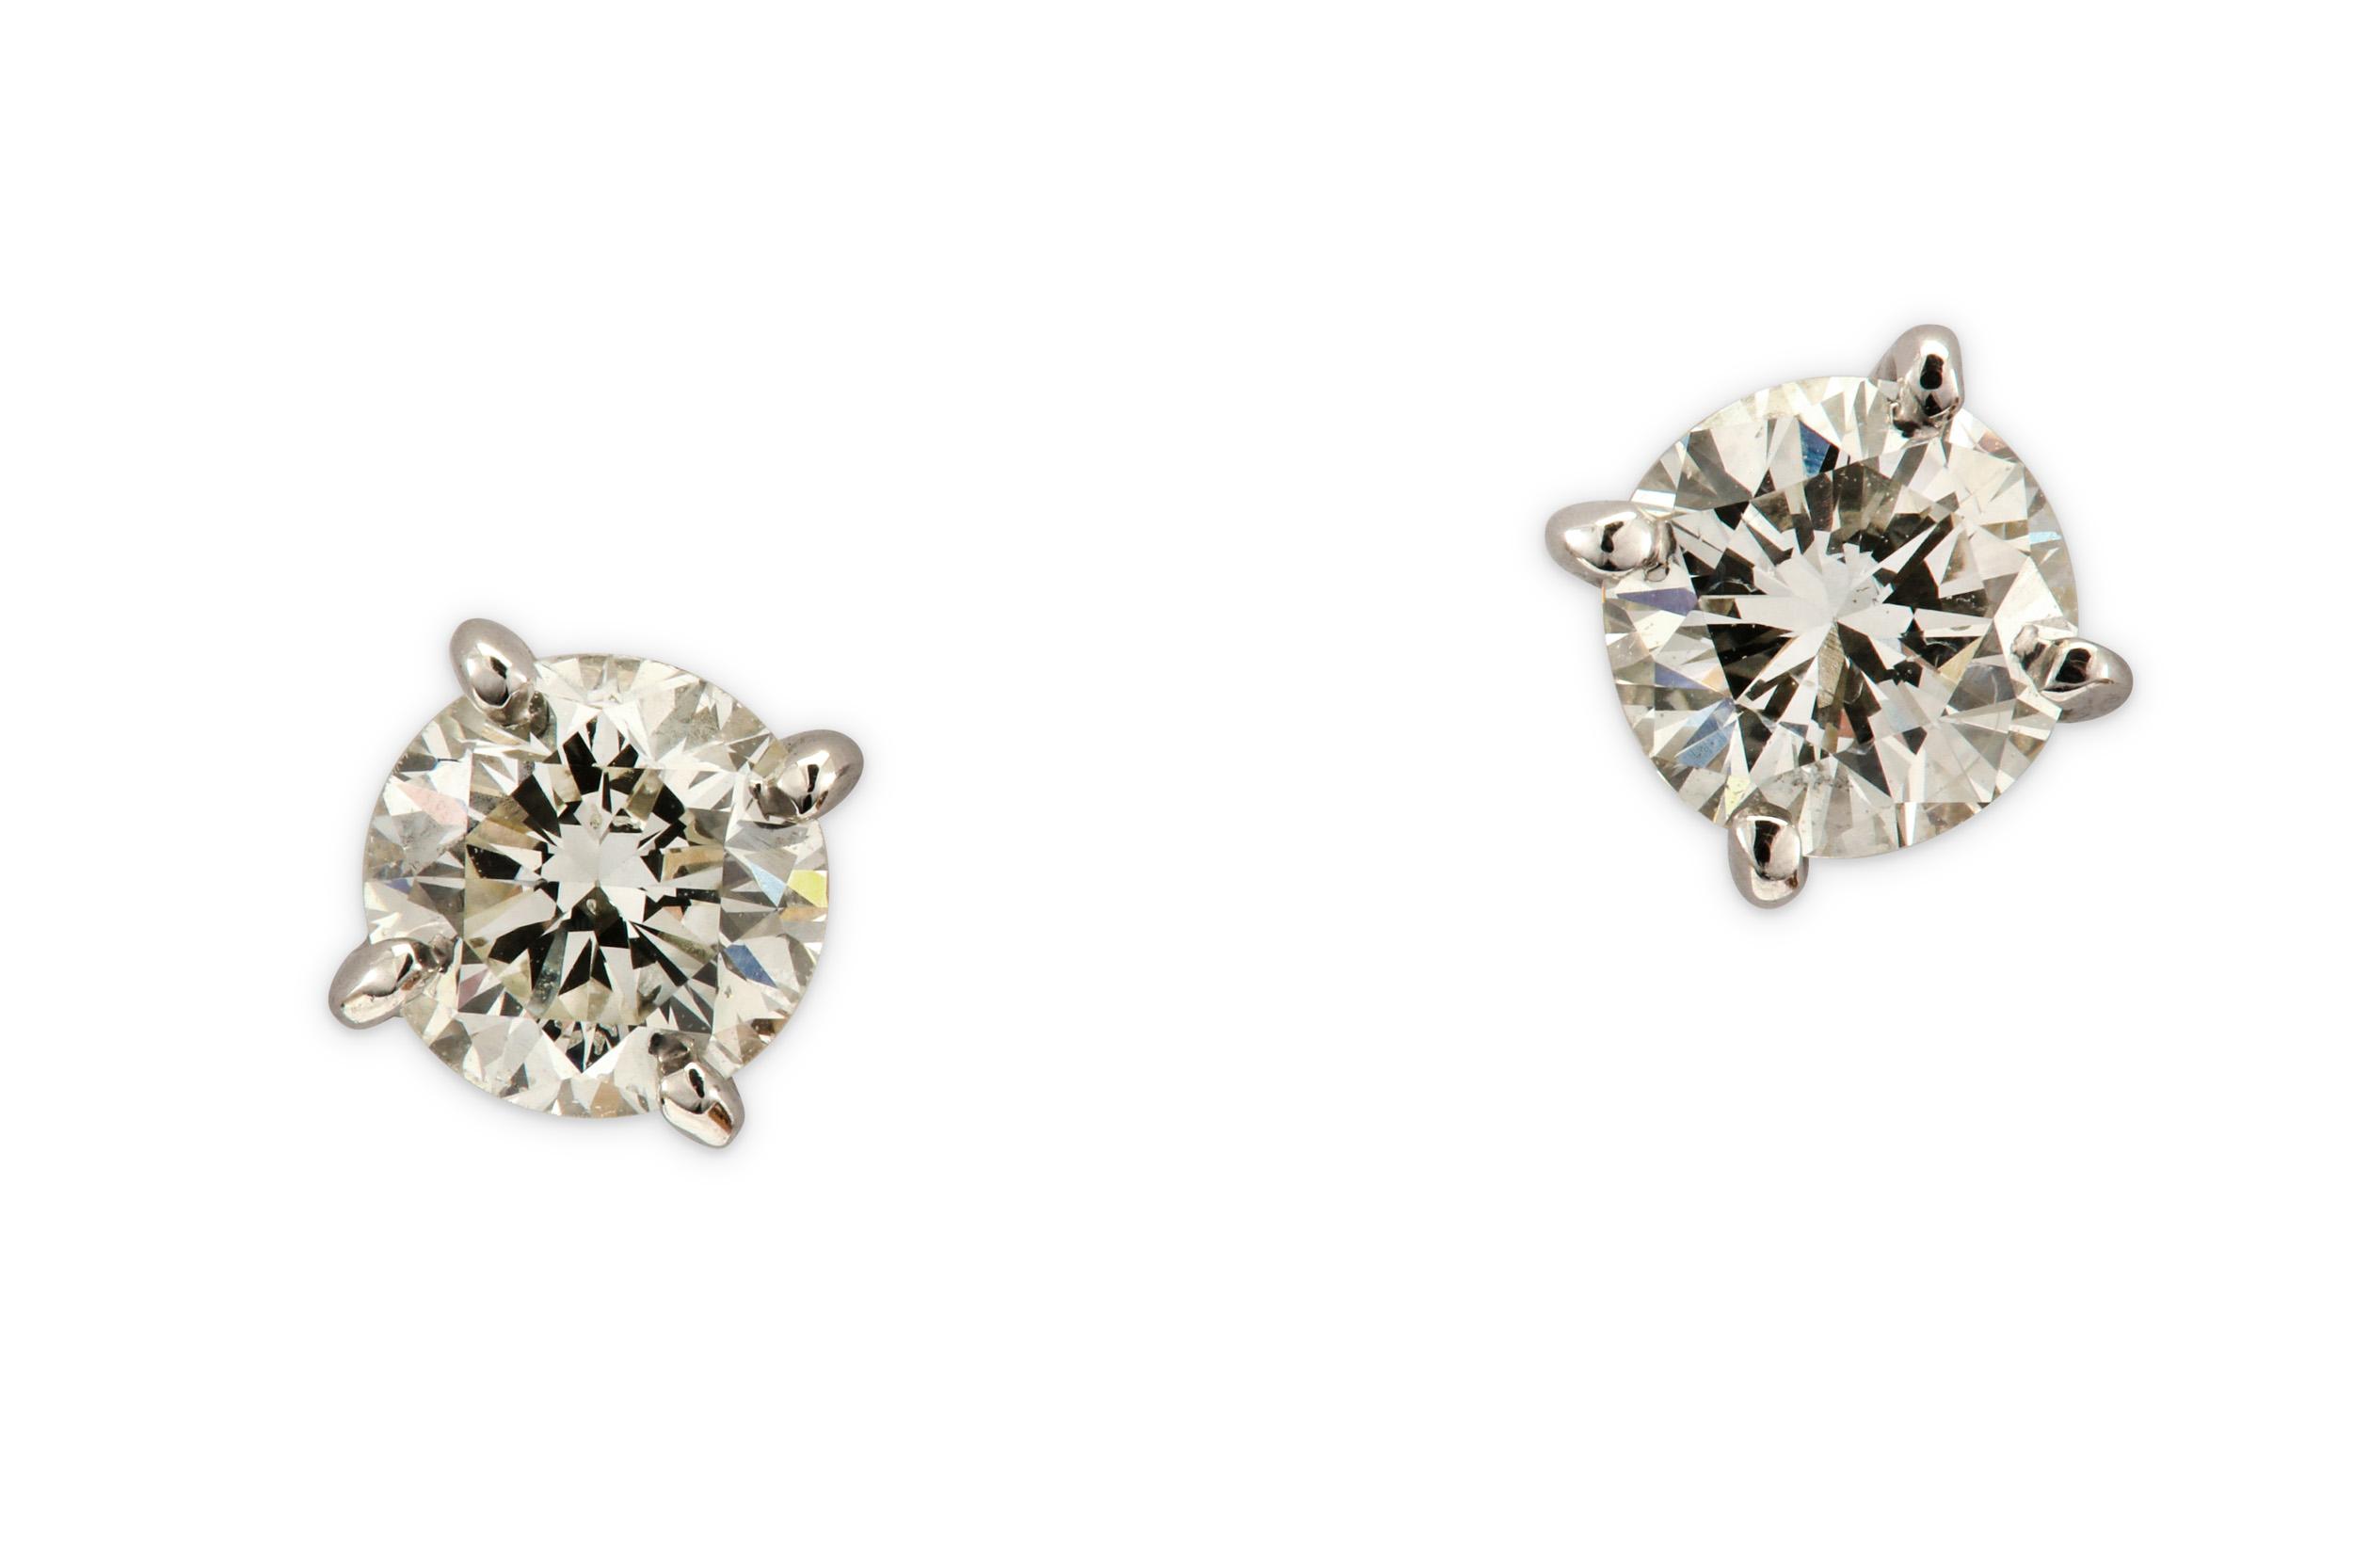 Lot 42 - A pair of diamond earstuds